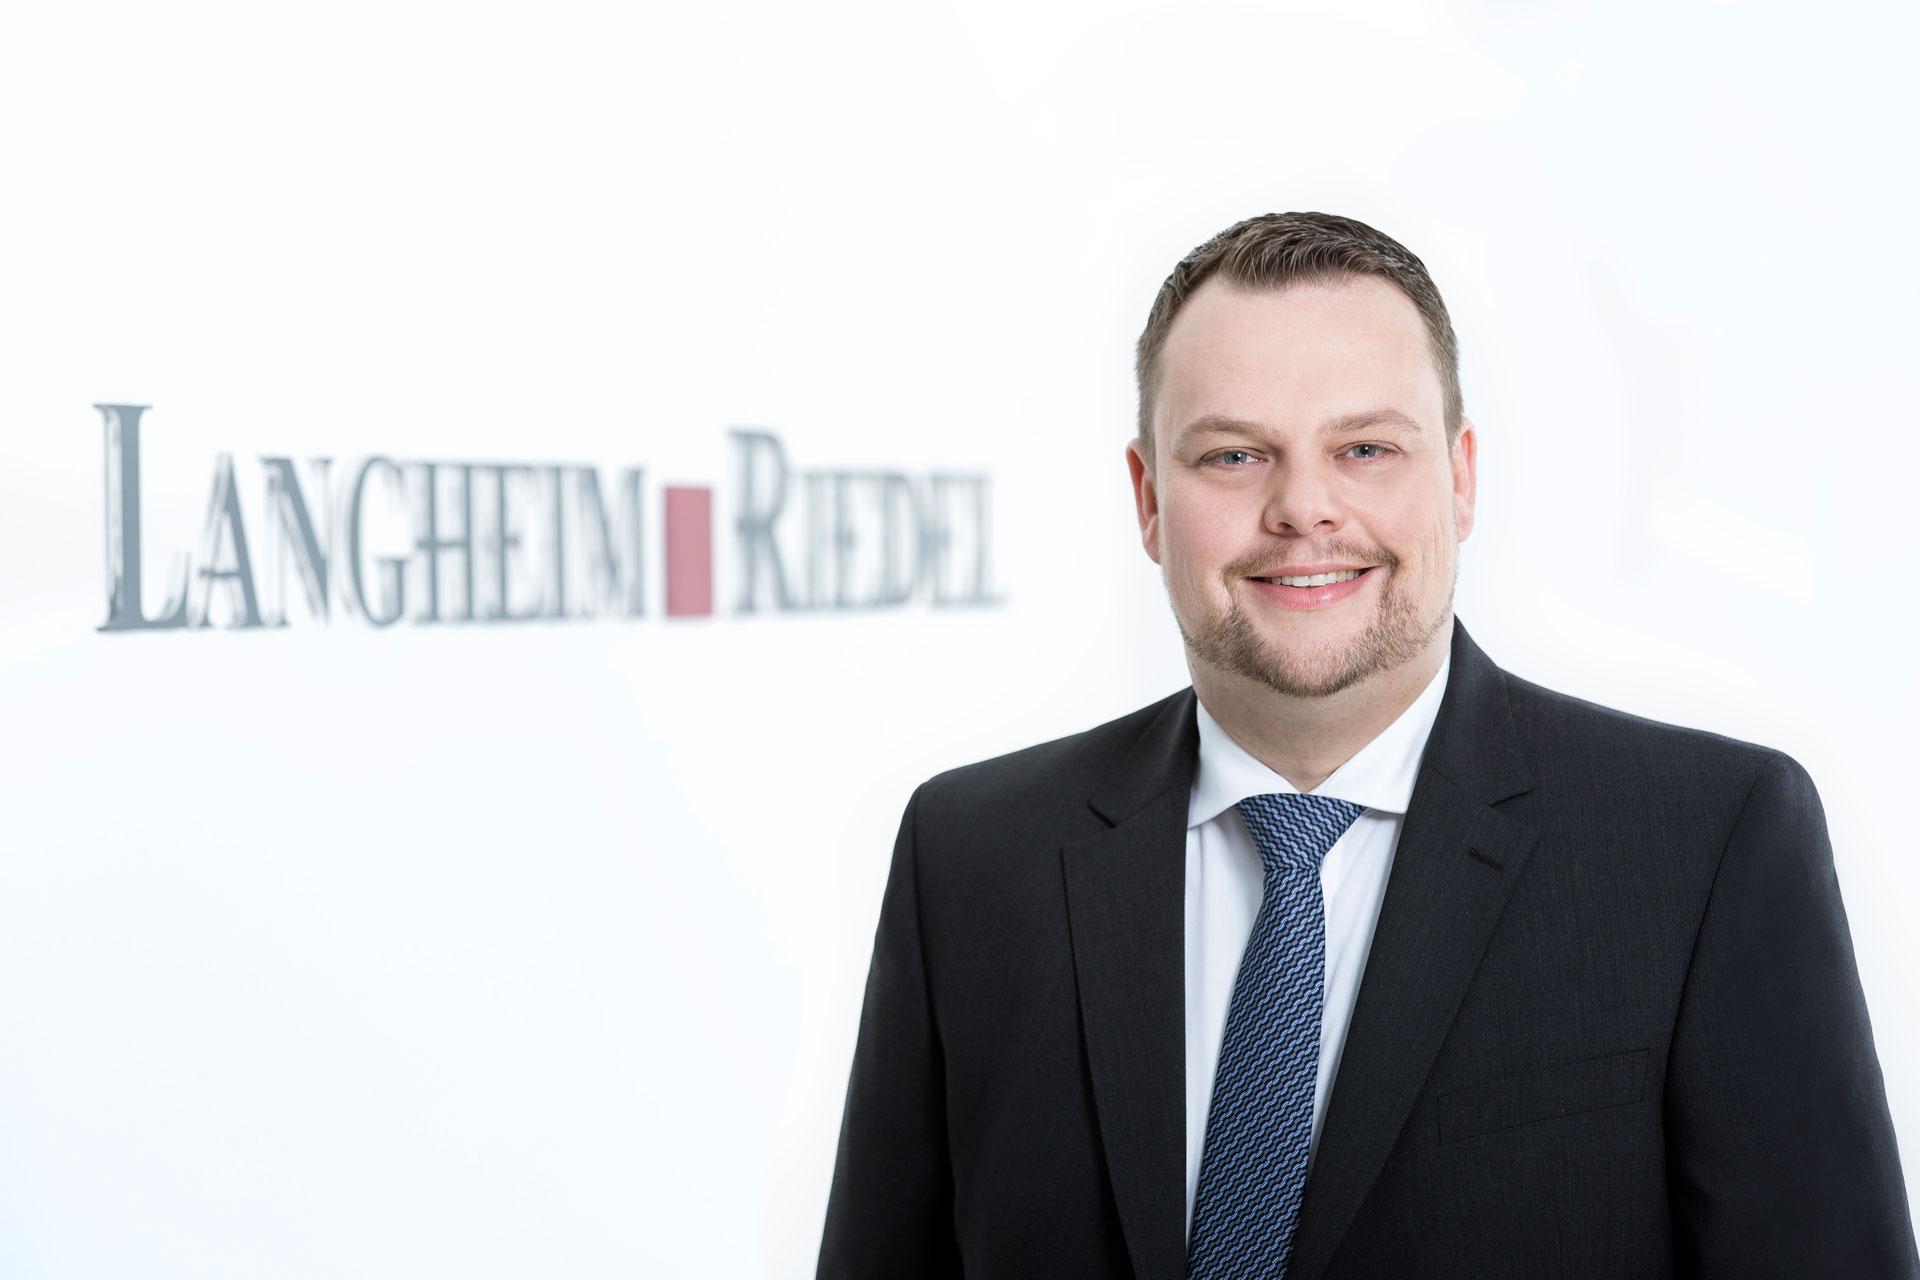 Christoph Brinkschröder